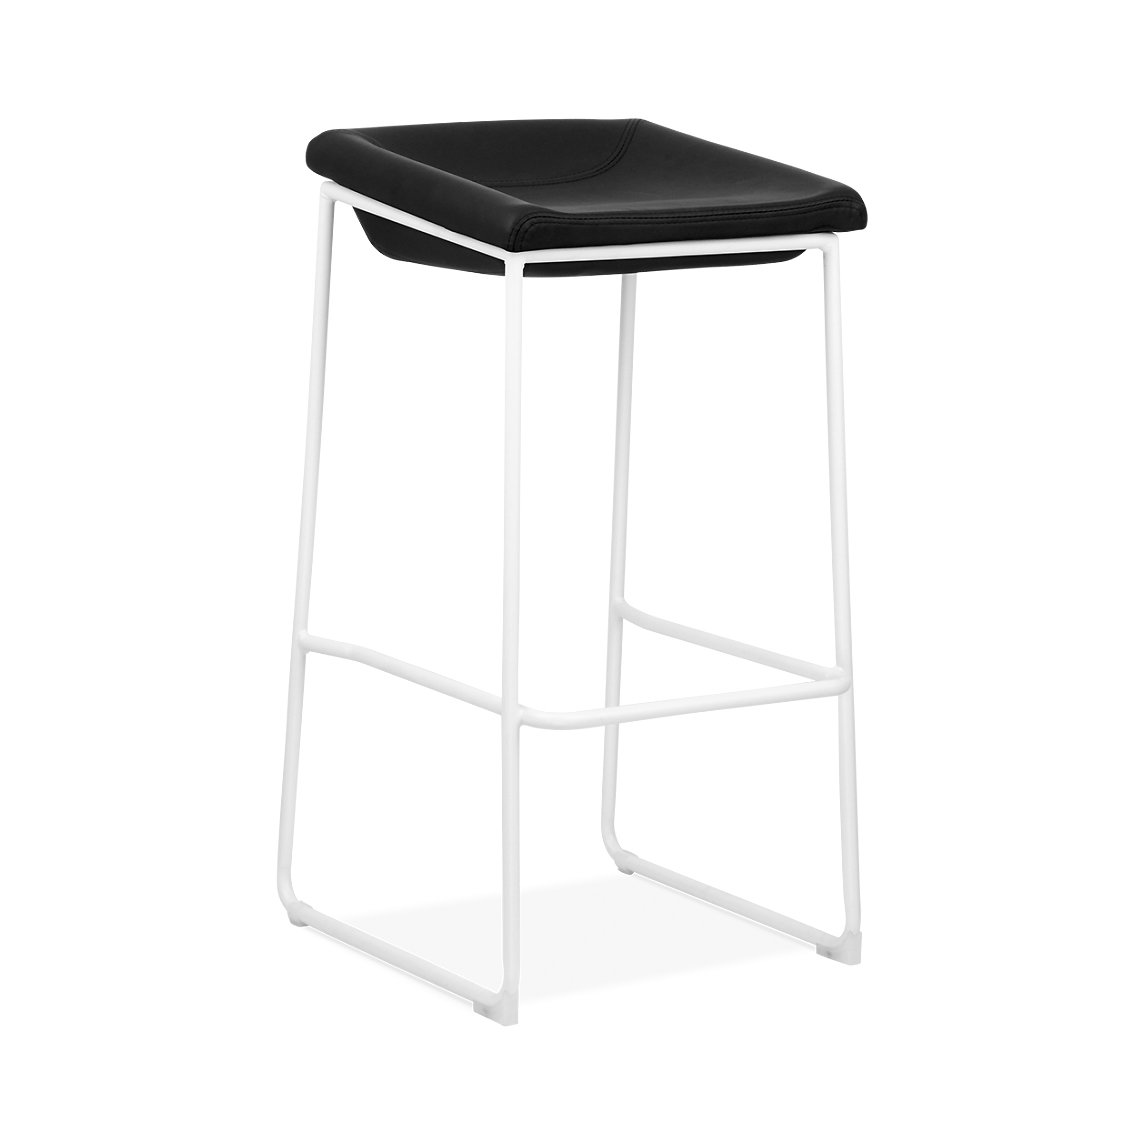 Design Lab MN LS-1010-WHTBLK Modello White Barstool Black Vinyl Seat , Set of 2